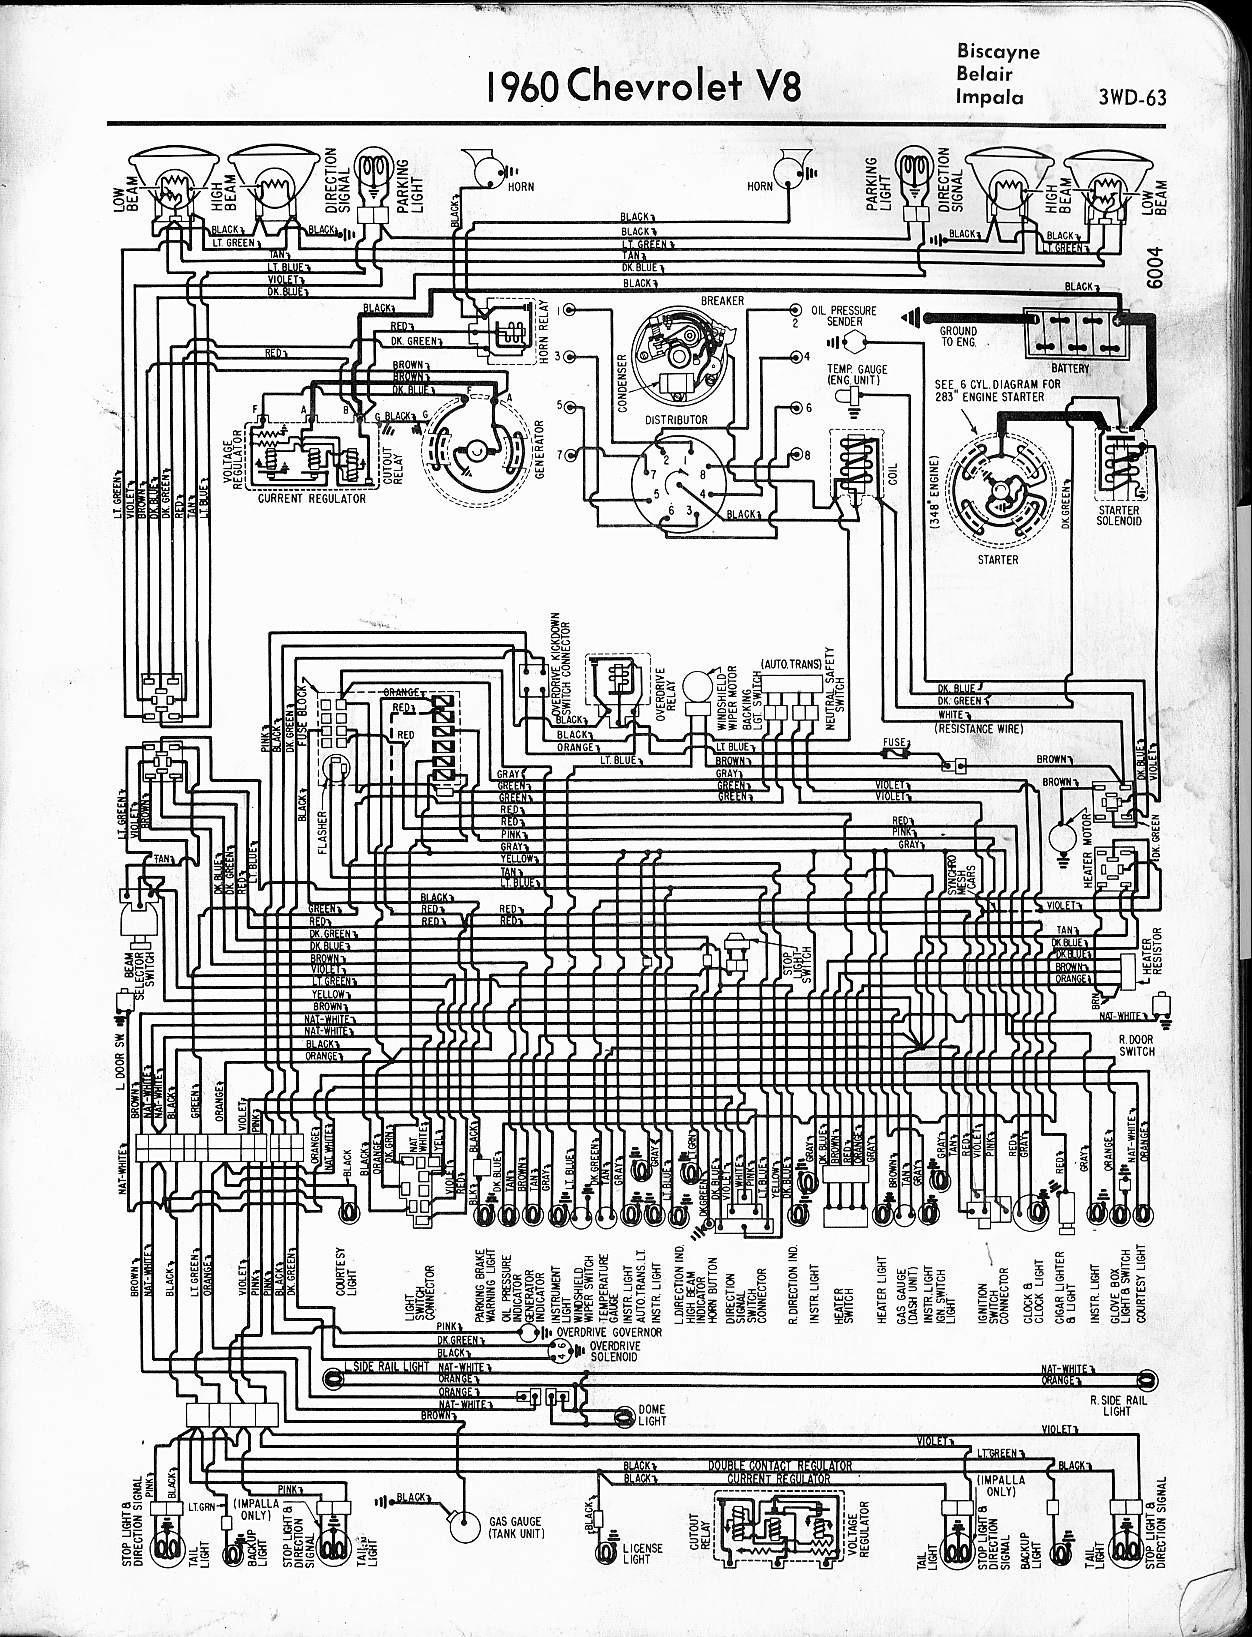 Diagram Of A V8 Engine Turn Signal Wiring Diagram Chevy Truck Shahsramblings Of Diagram Of A V8 Engine